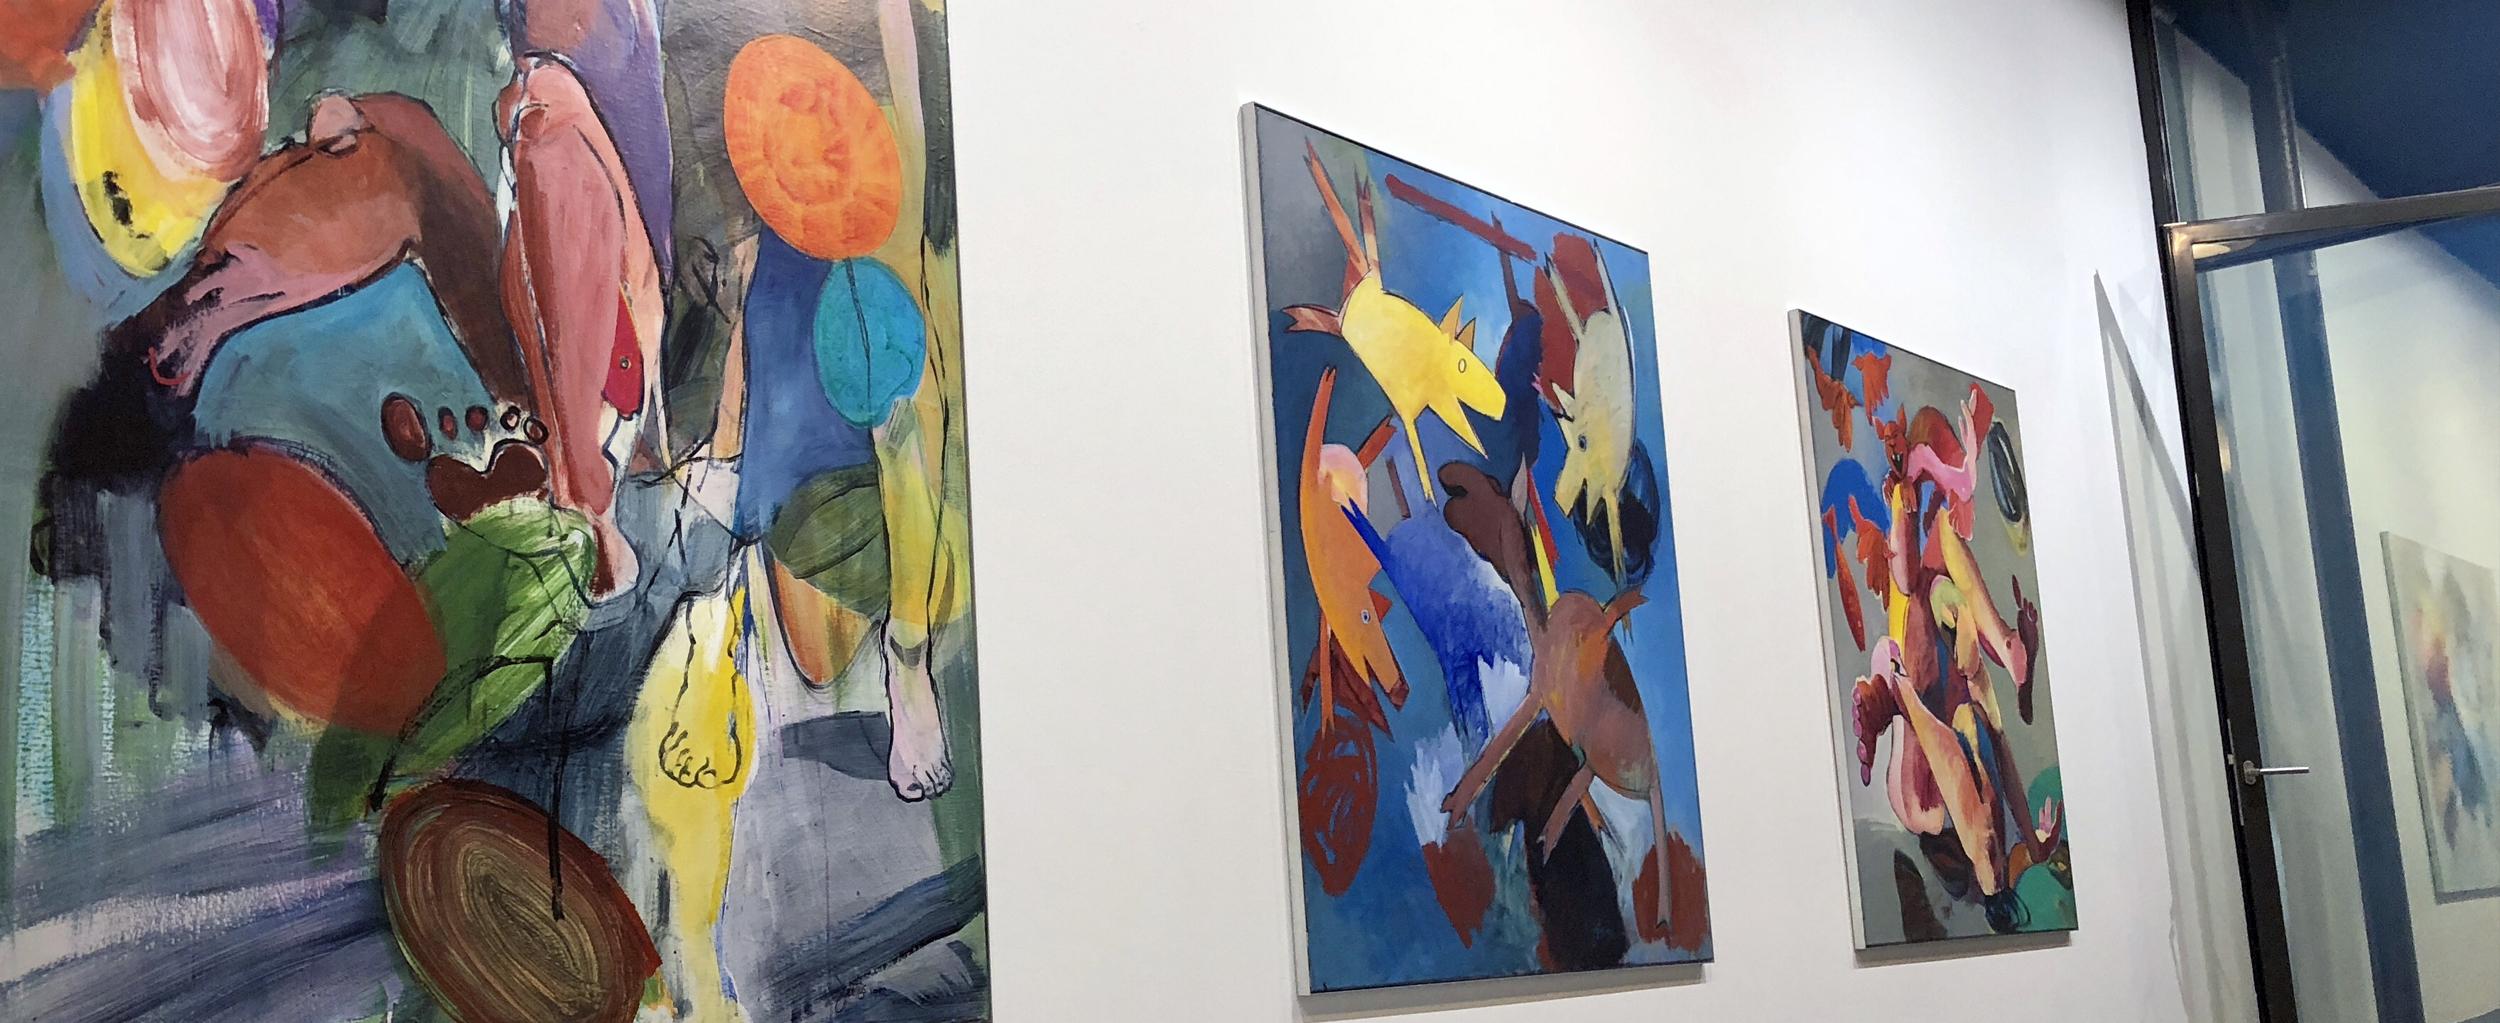 Zomerexpositie WTC Rotterdam Art Gallery